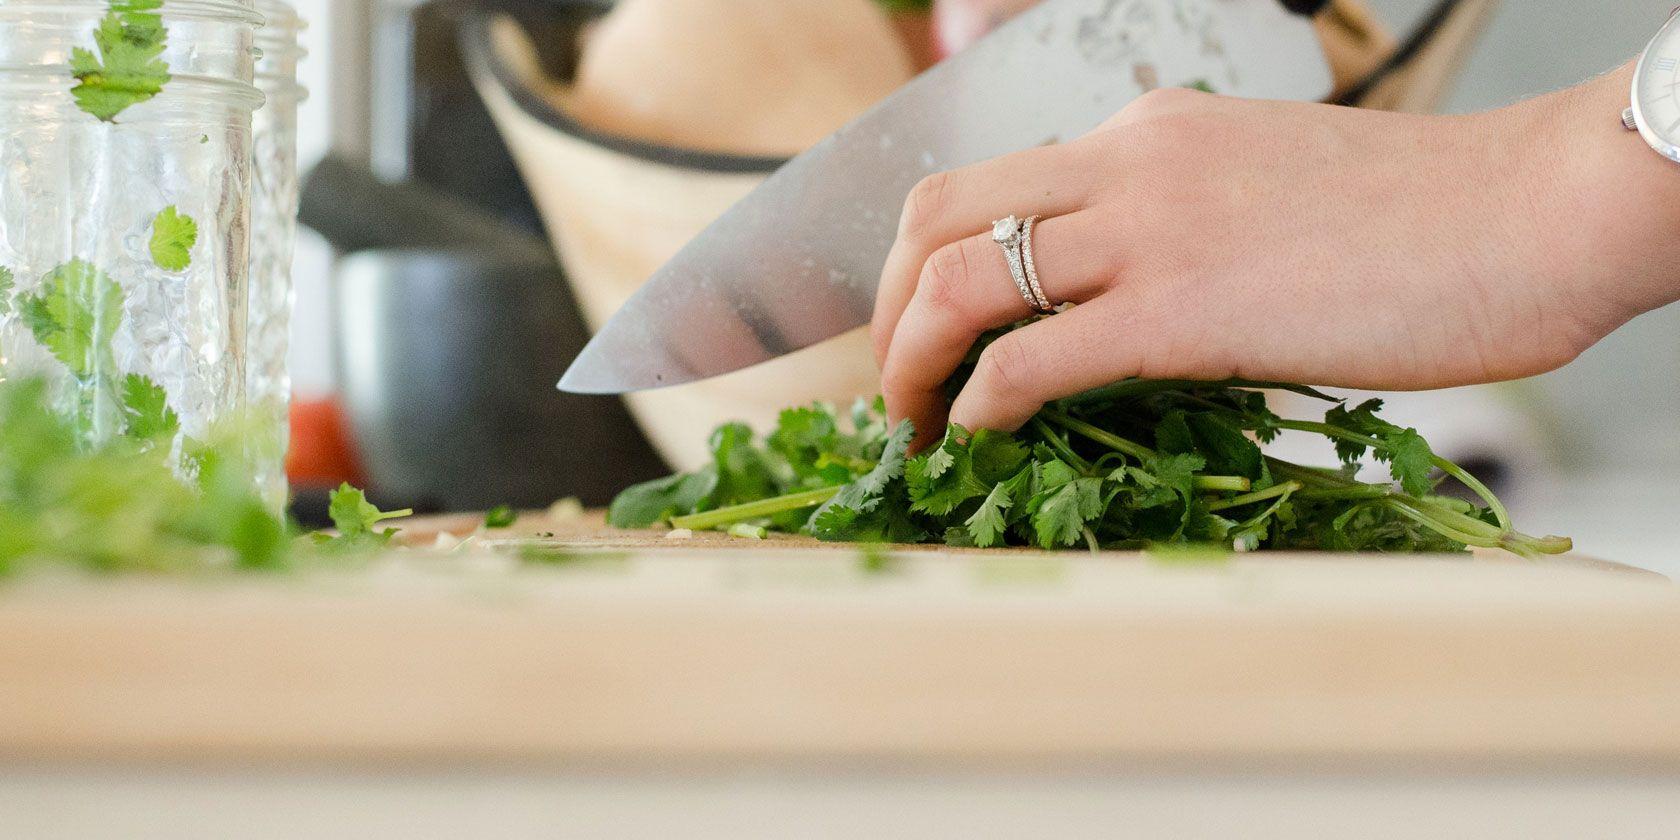 cooking-sites-beginners